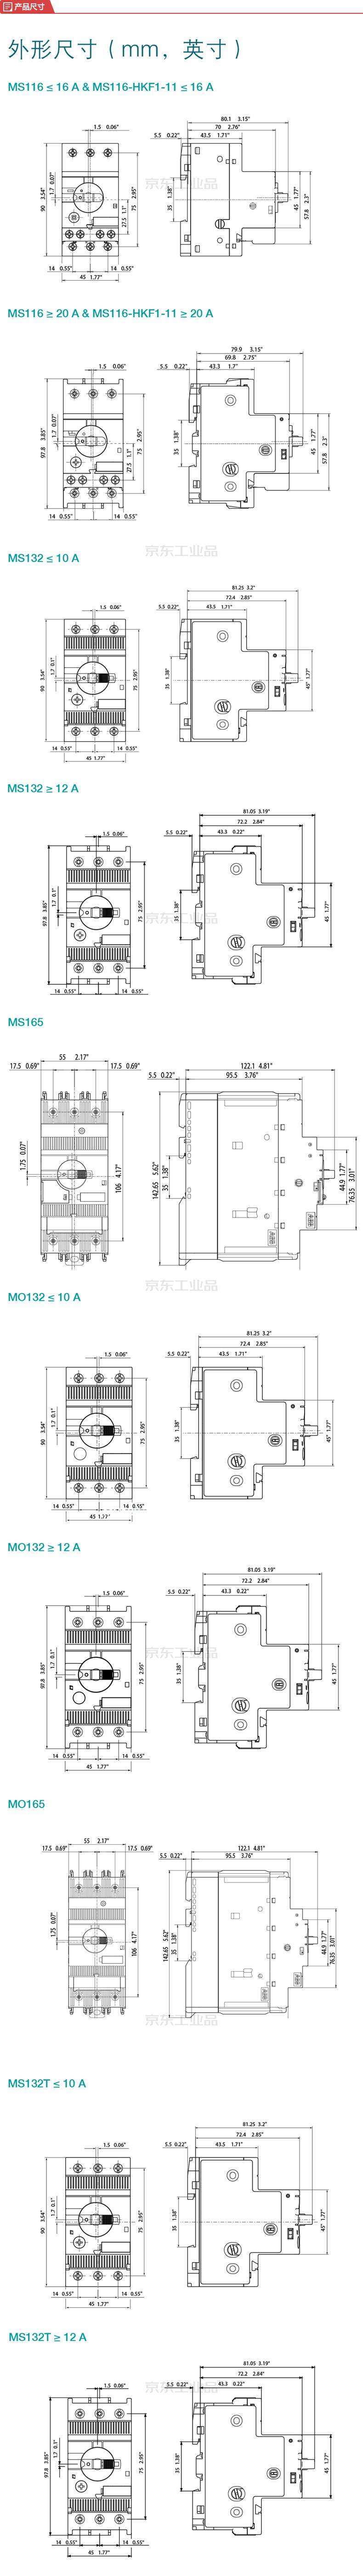 ABB 电动机保护用断路器;MS116-10.0